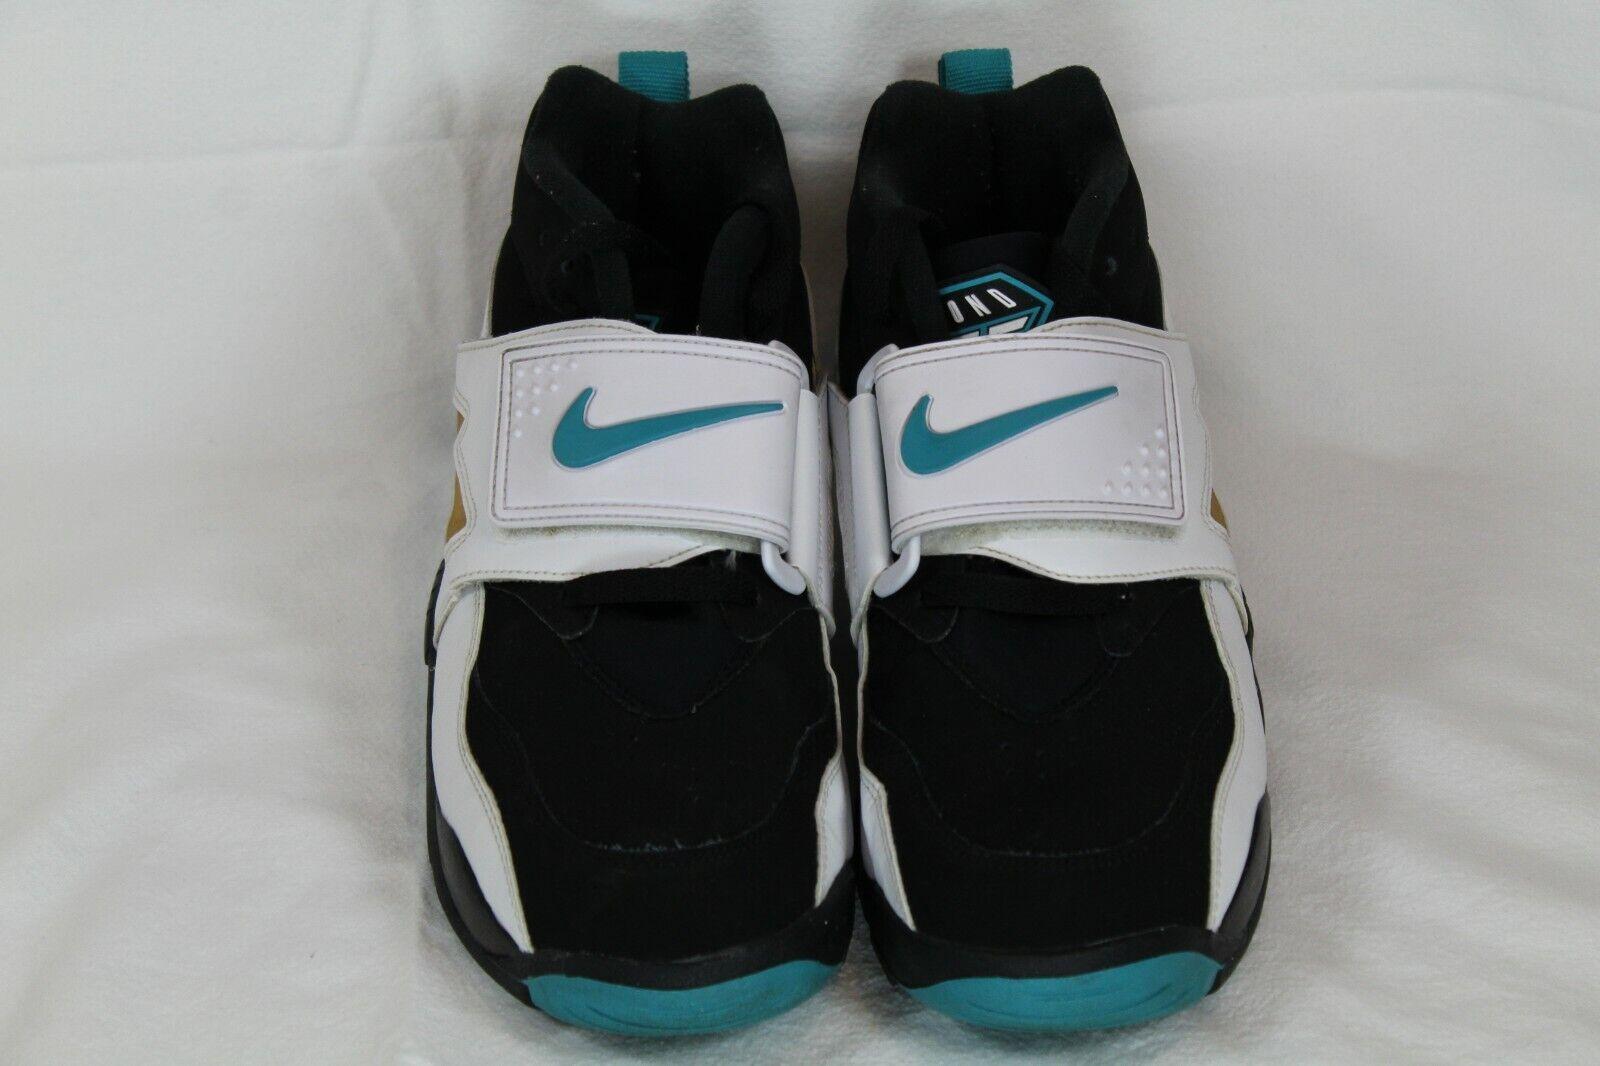 7b1a1145360b36 Nike Air Diamond Turf Emerald Size Size Size 9 309434-013 33212b ...